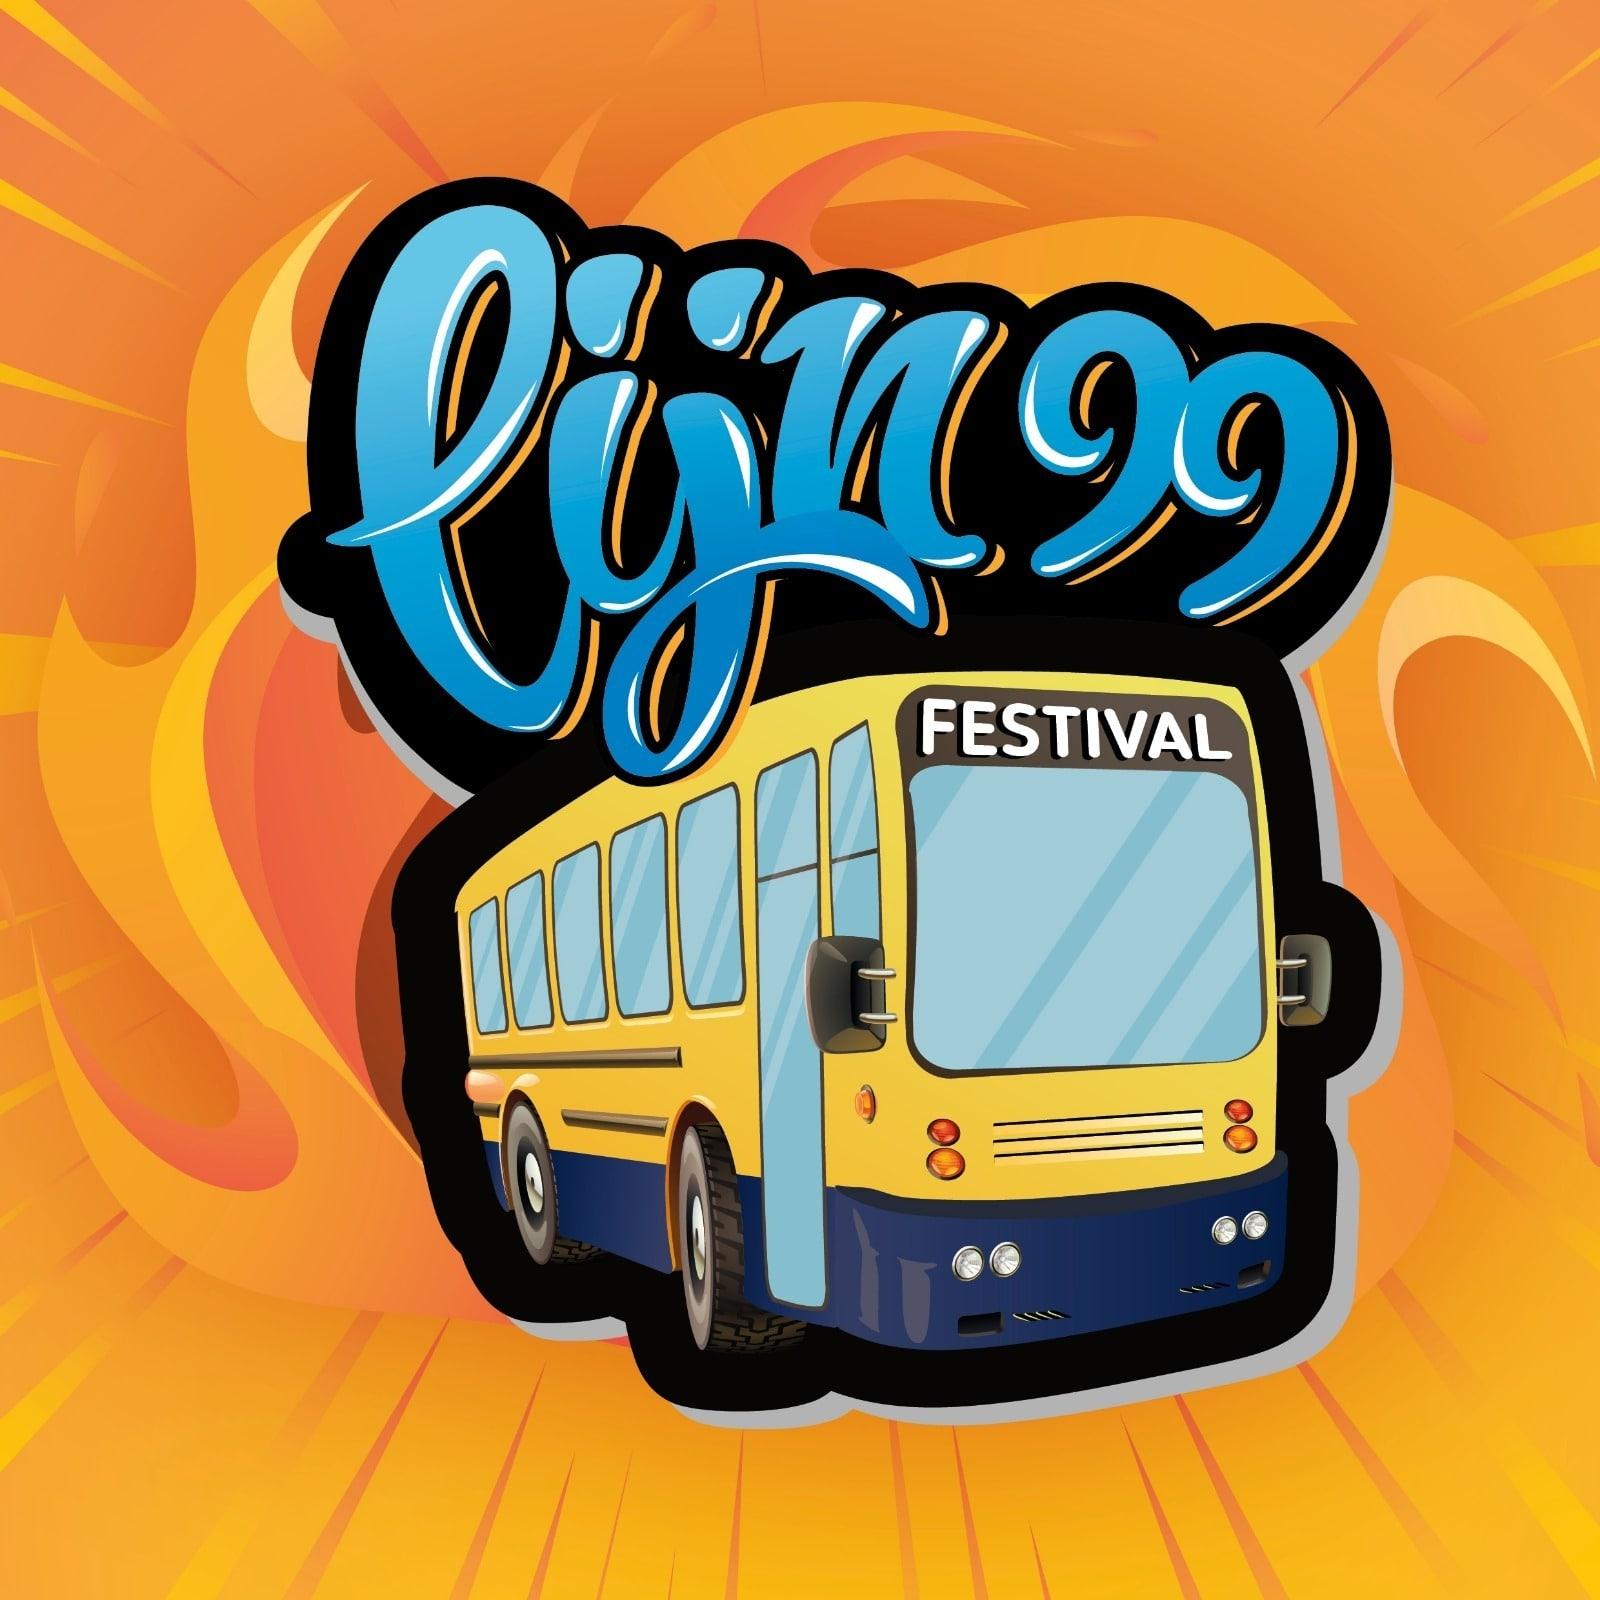 Lijn 99 festival